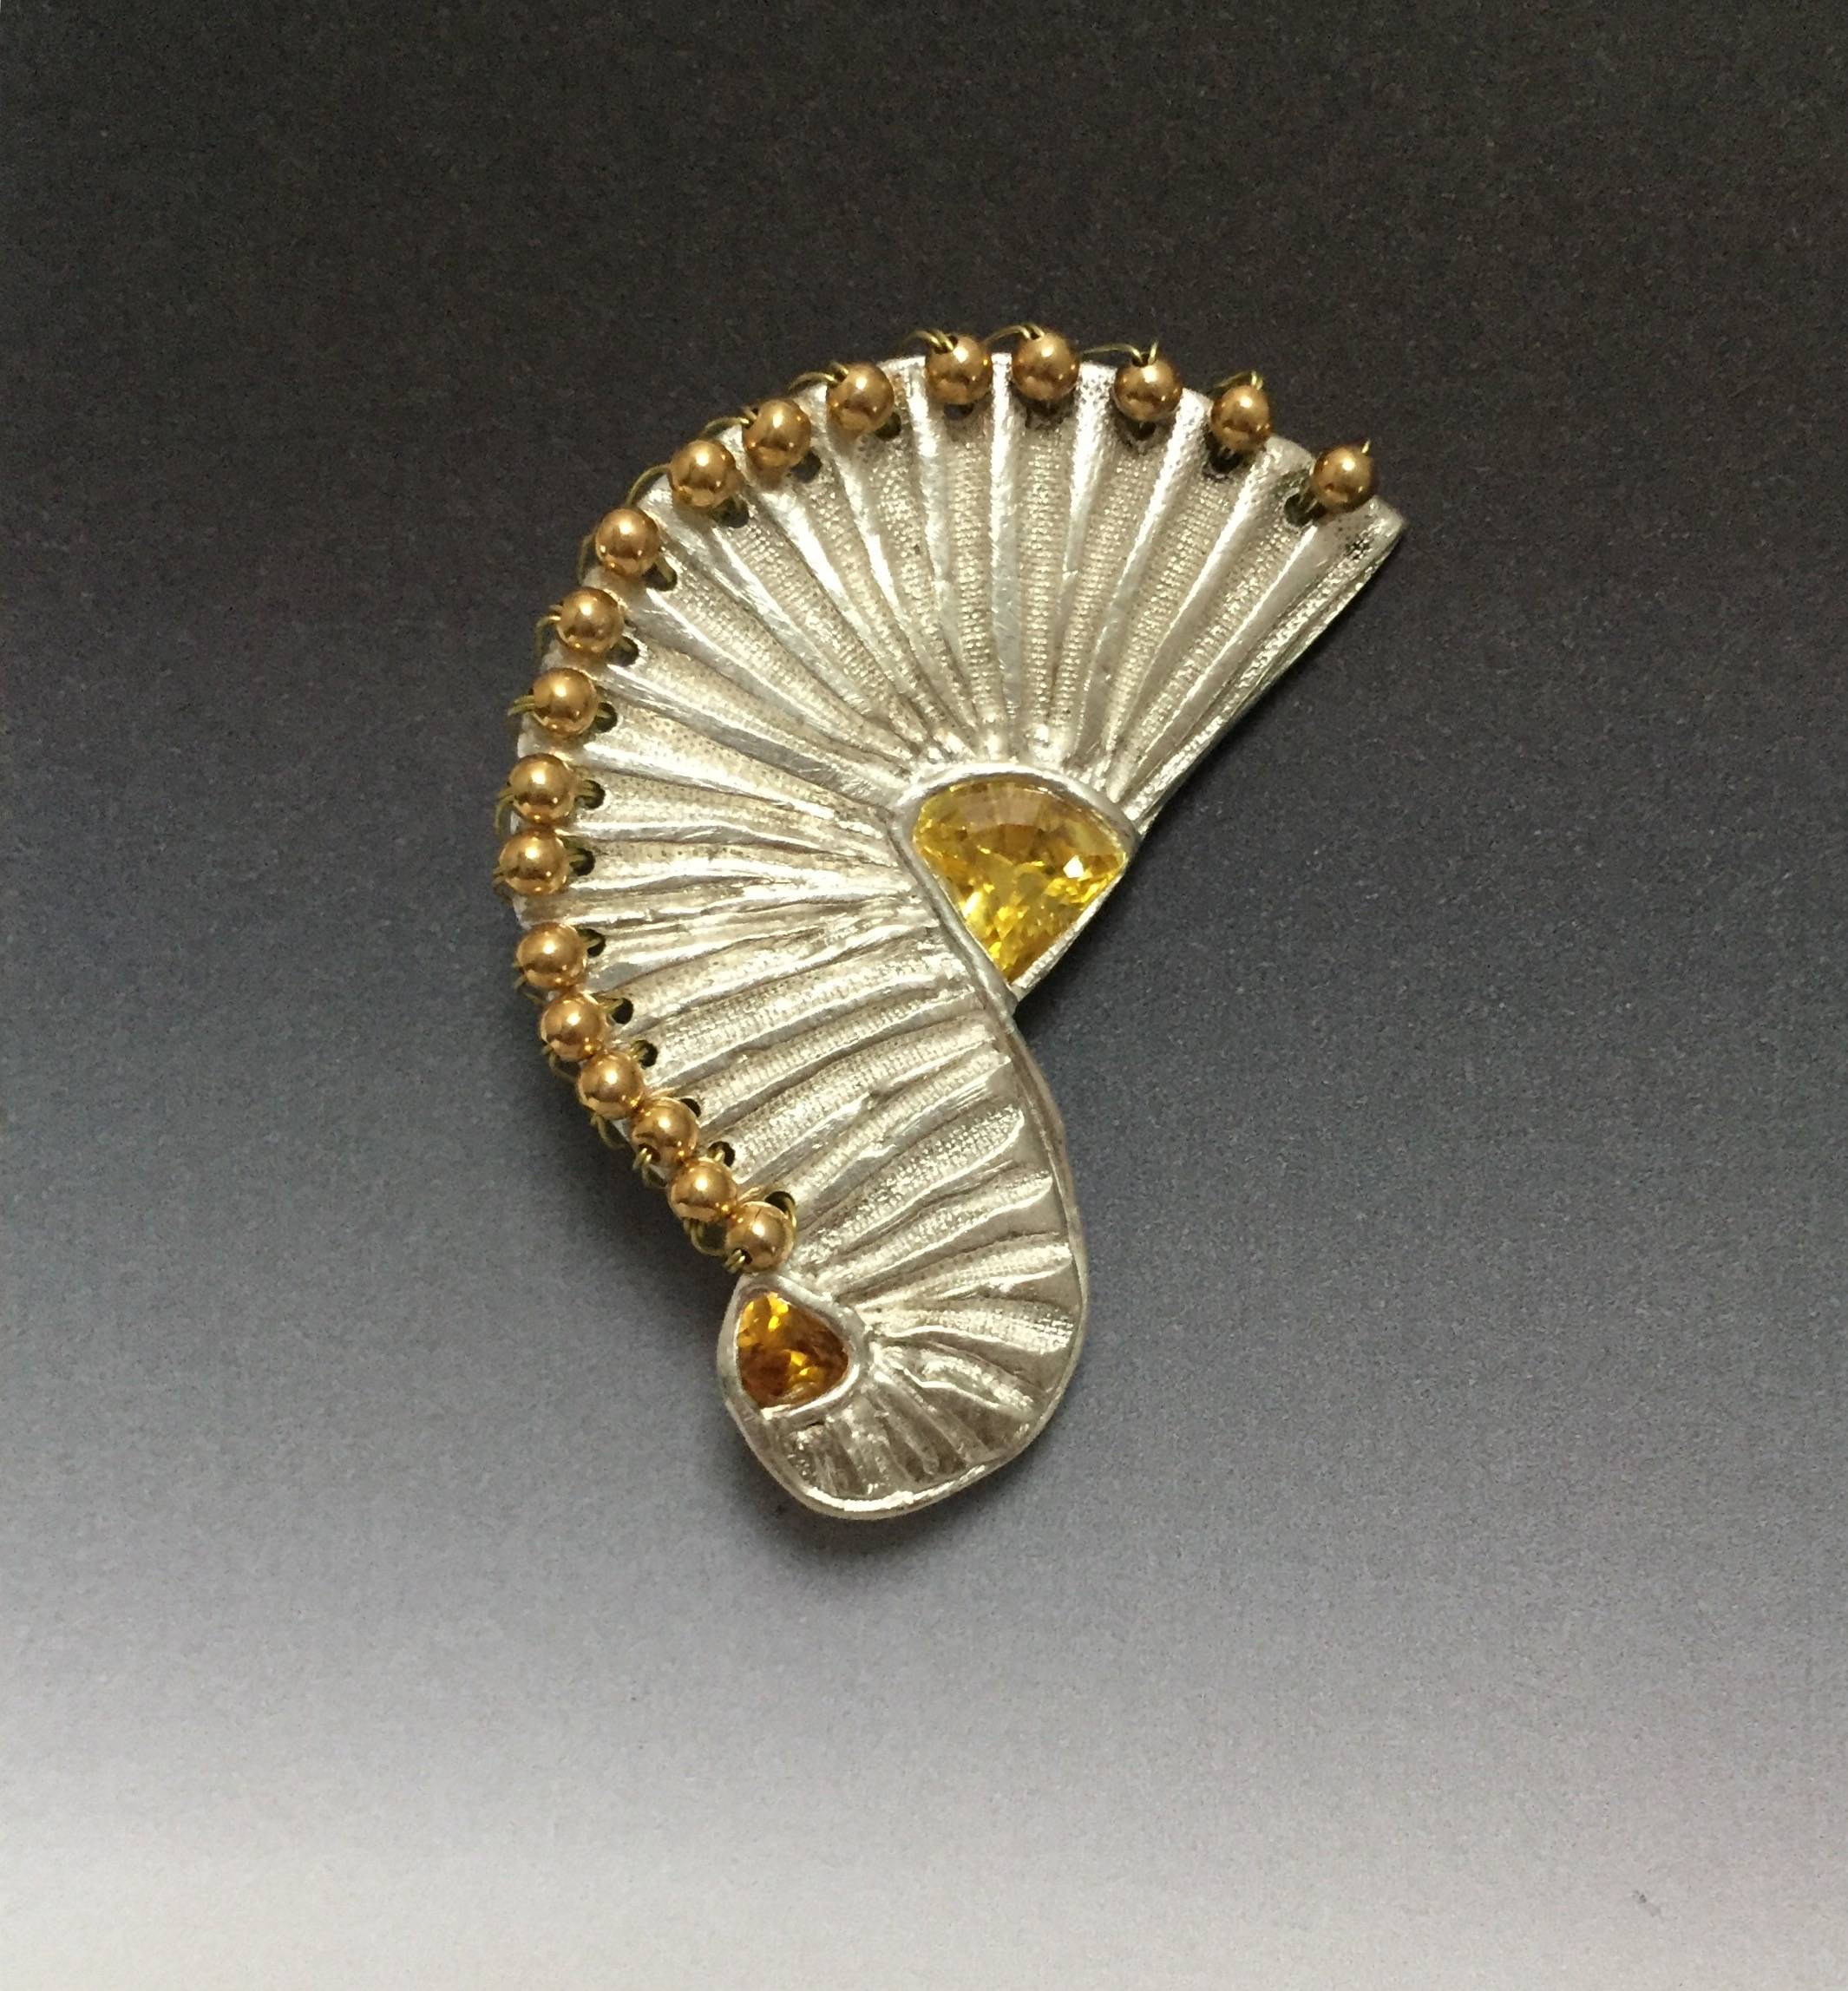 GOLD ON SILVER Brooch